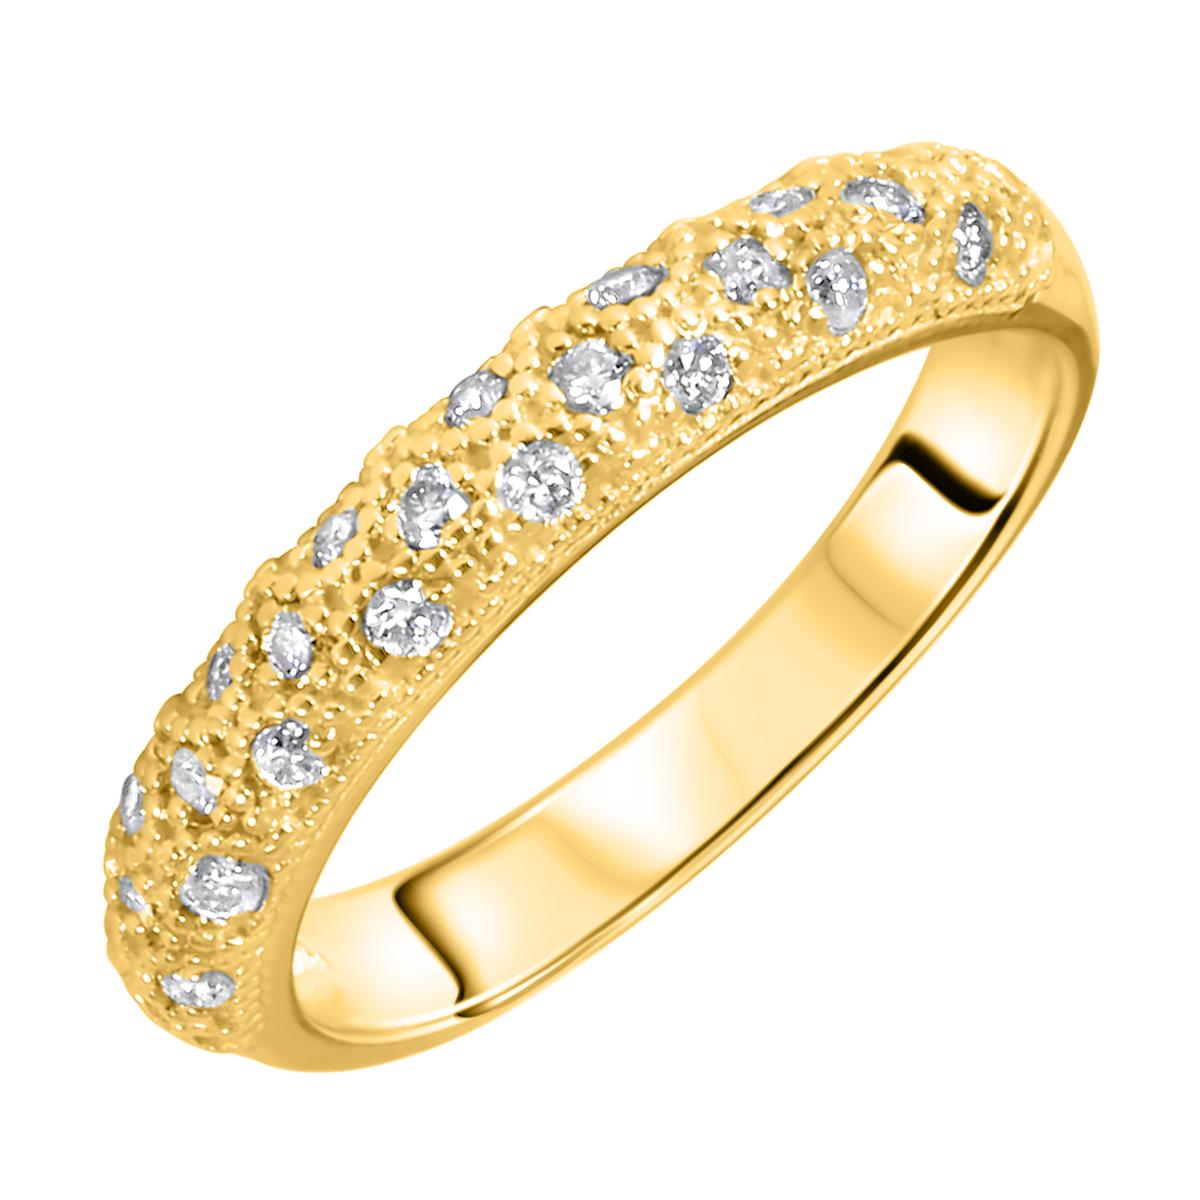 1/4 Carat T.W. Round Cut Diamond Ladies Wedding Band 14K Yellow Gold- Size 8